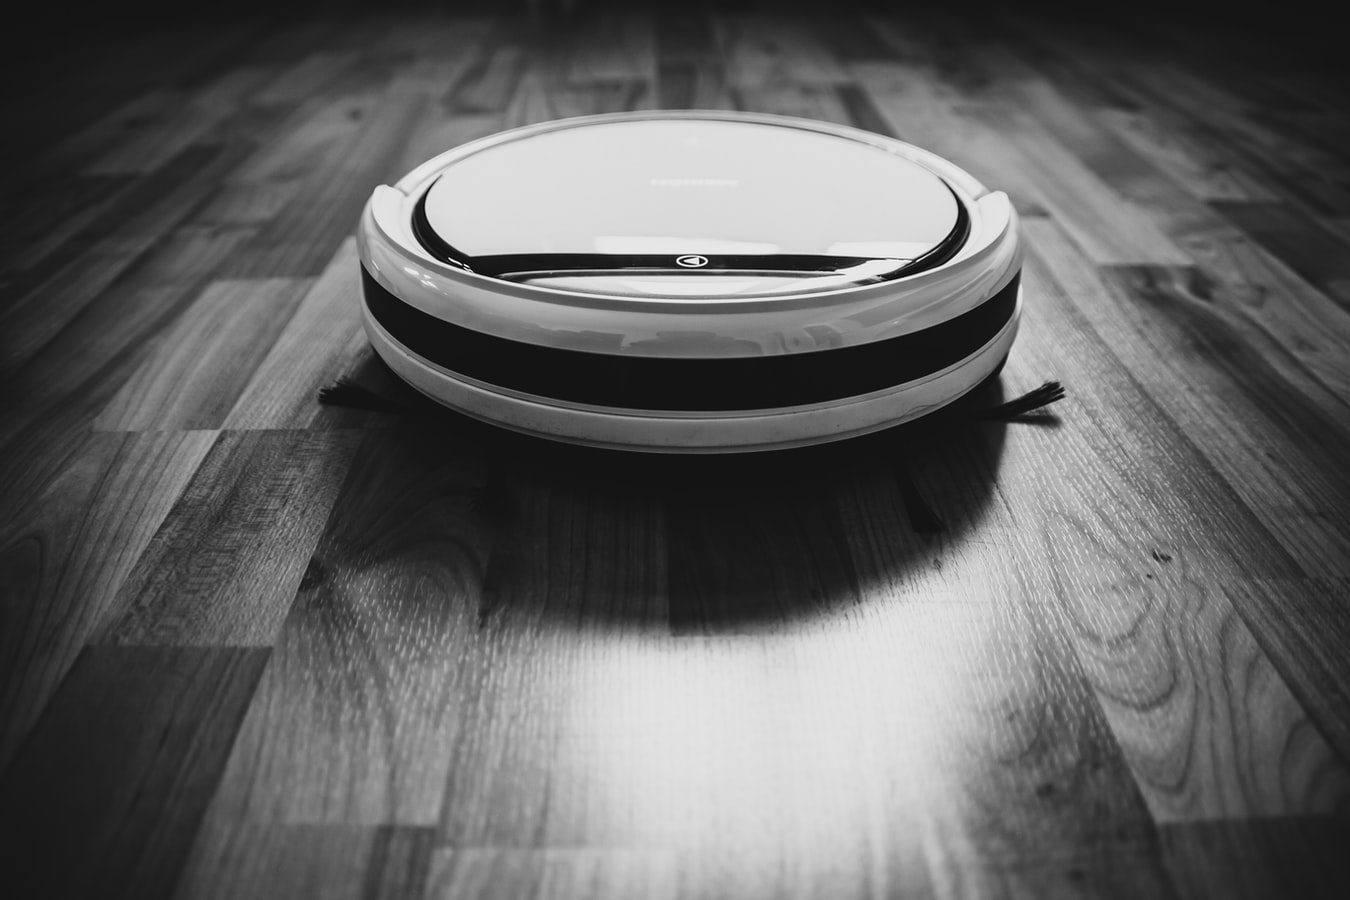 Domestic Household Robot